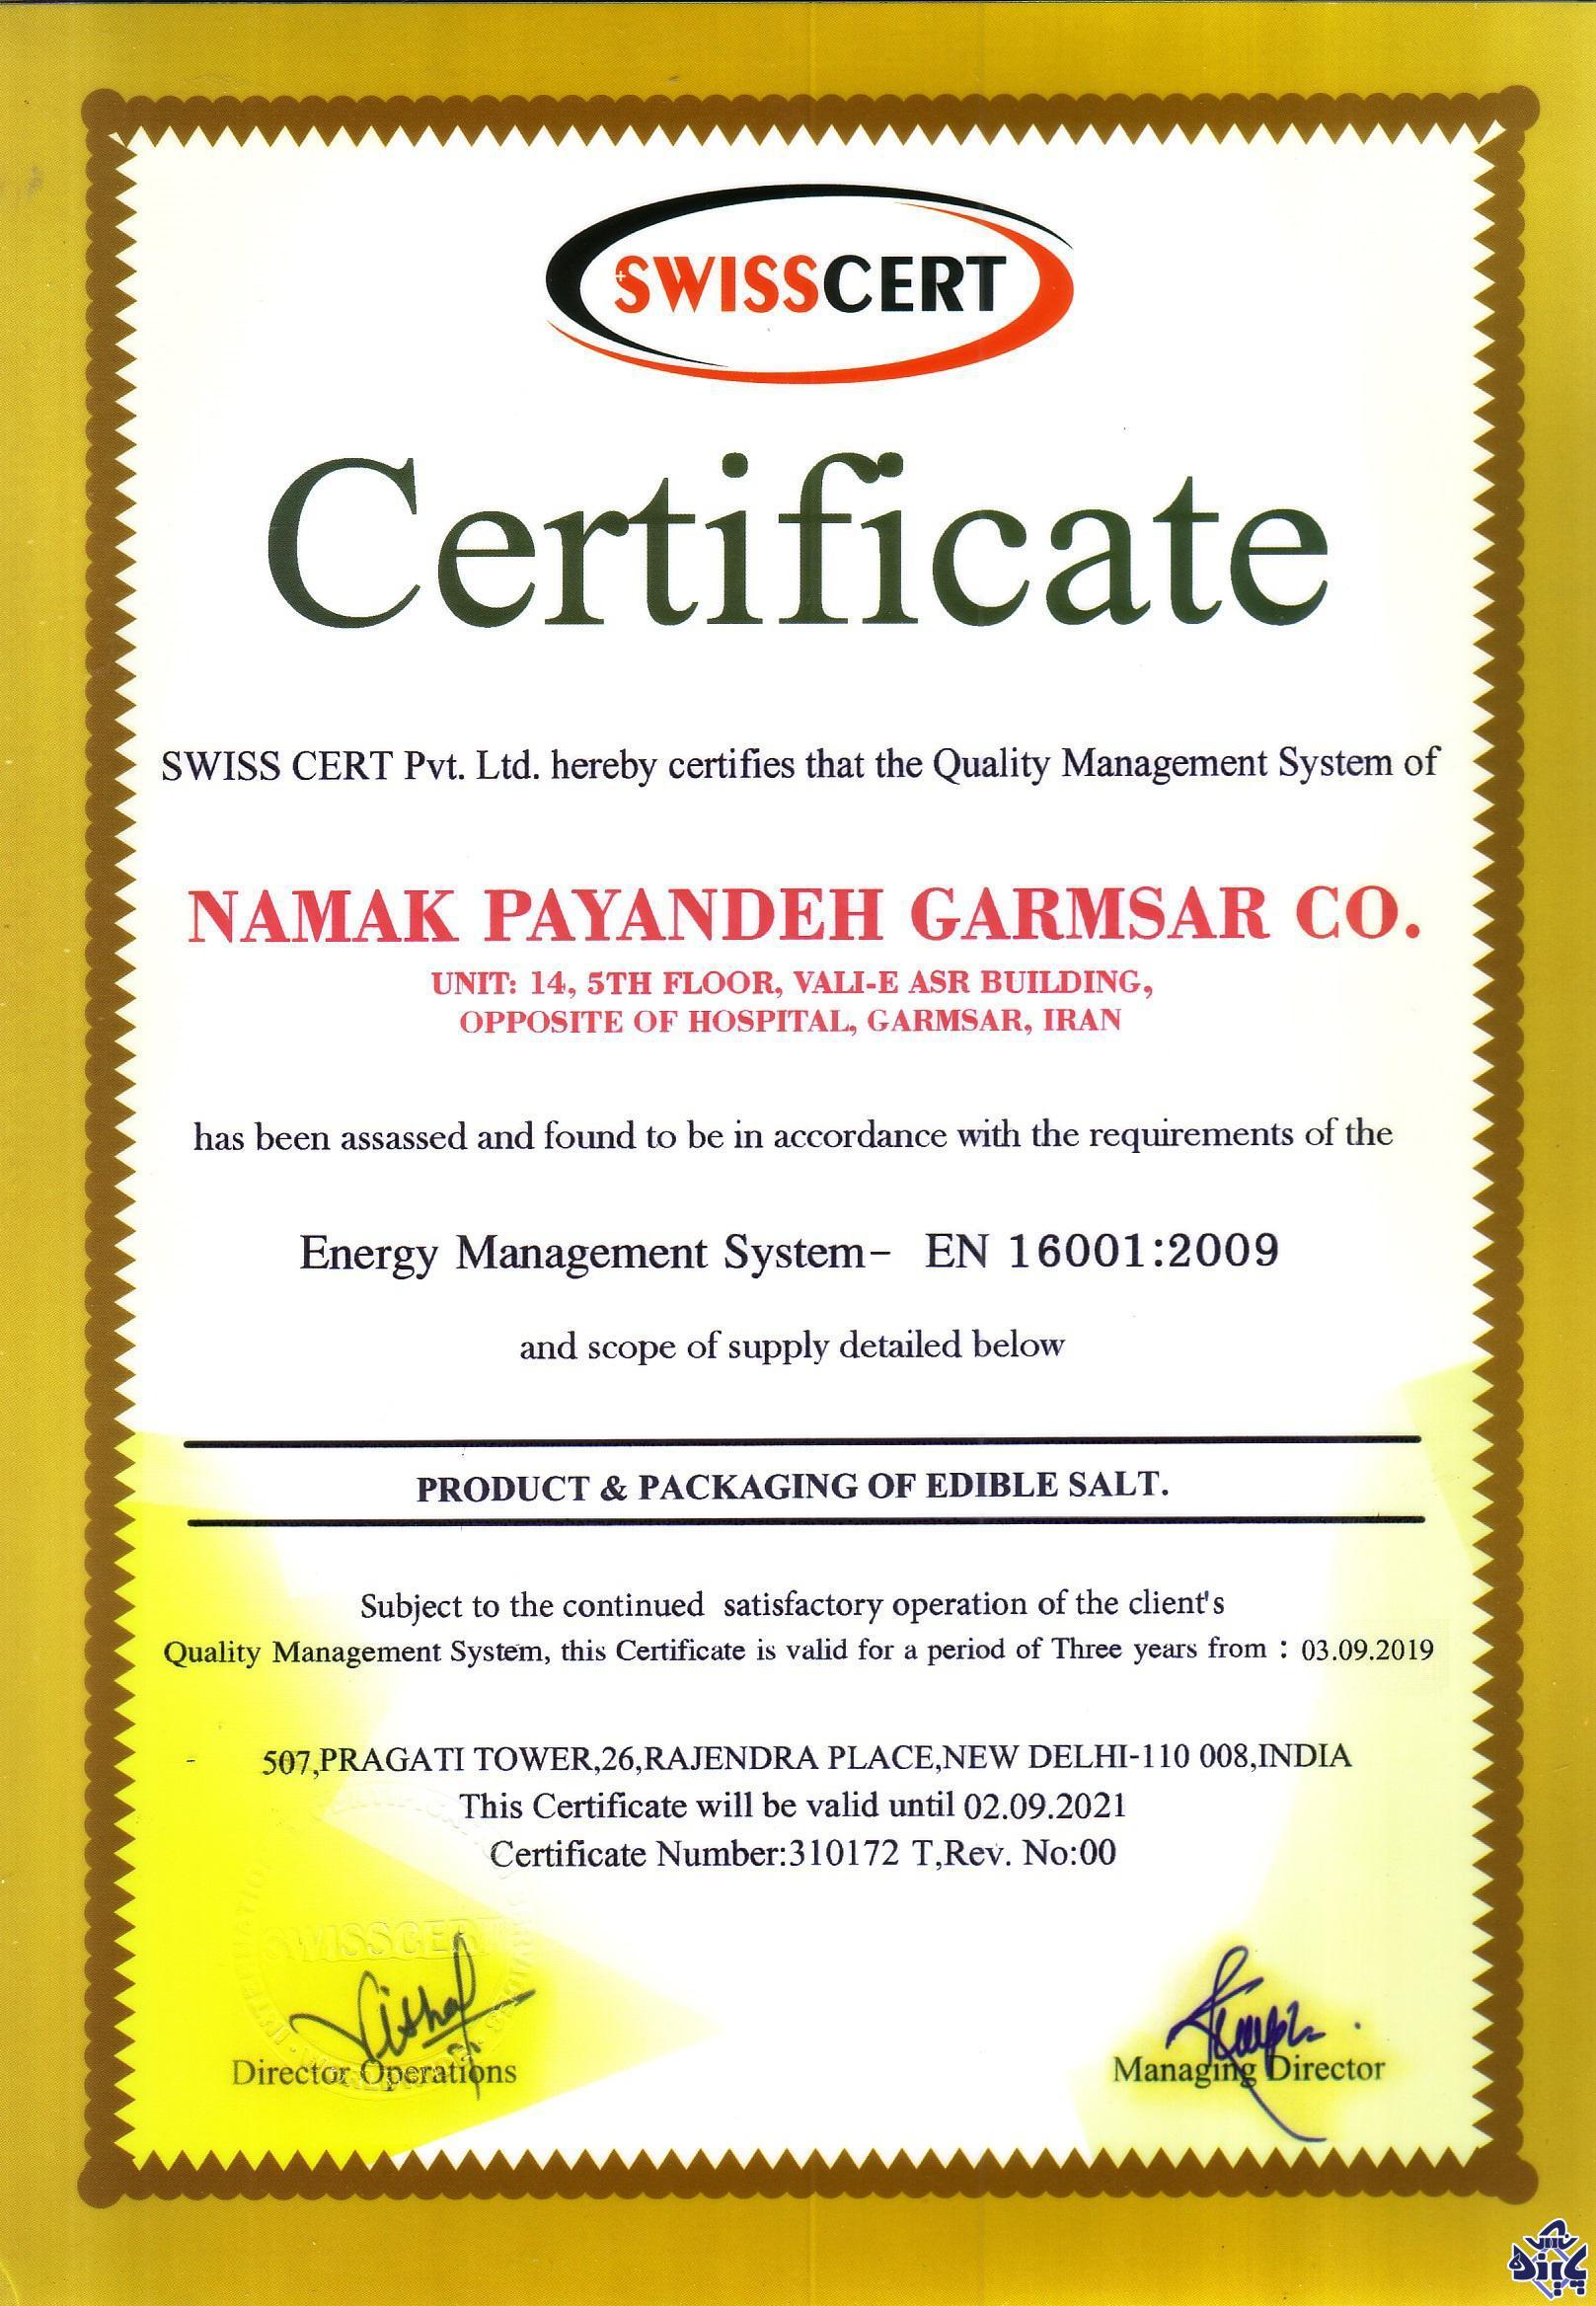 استاندارد مدیریت انرژی EN 16001 2009